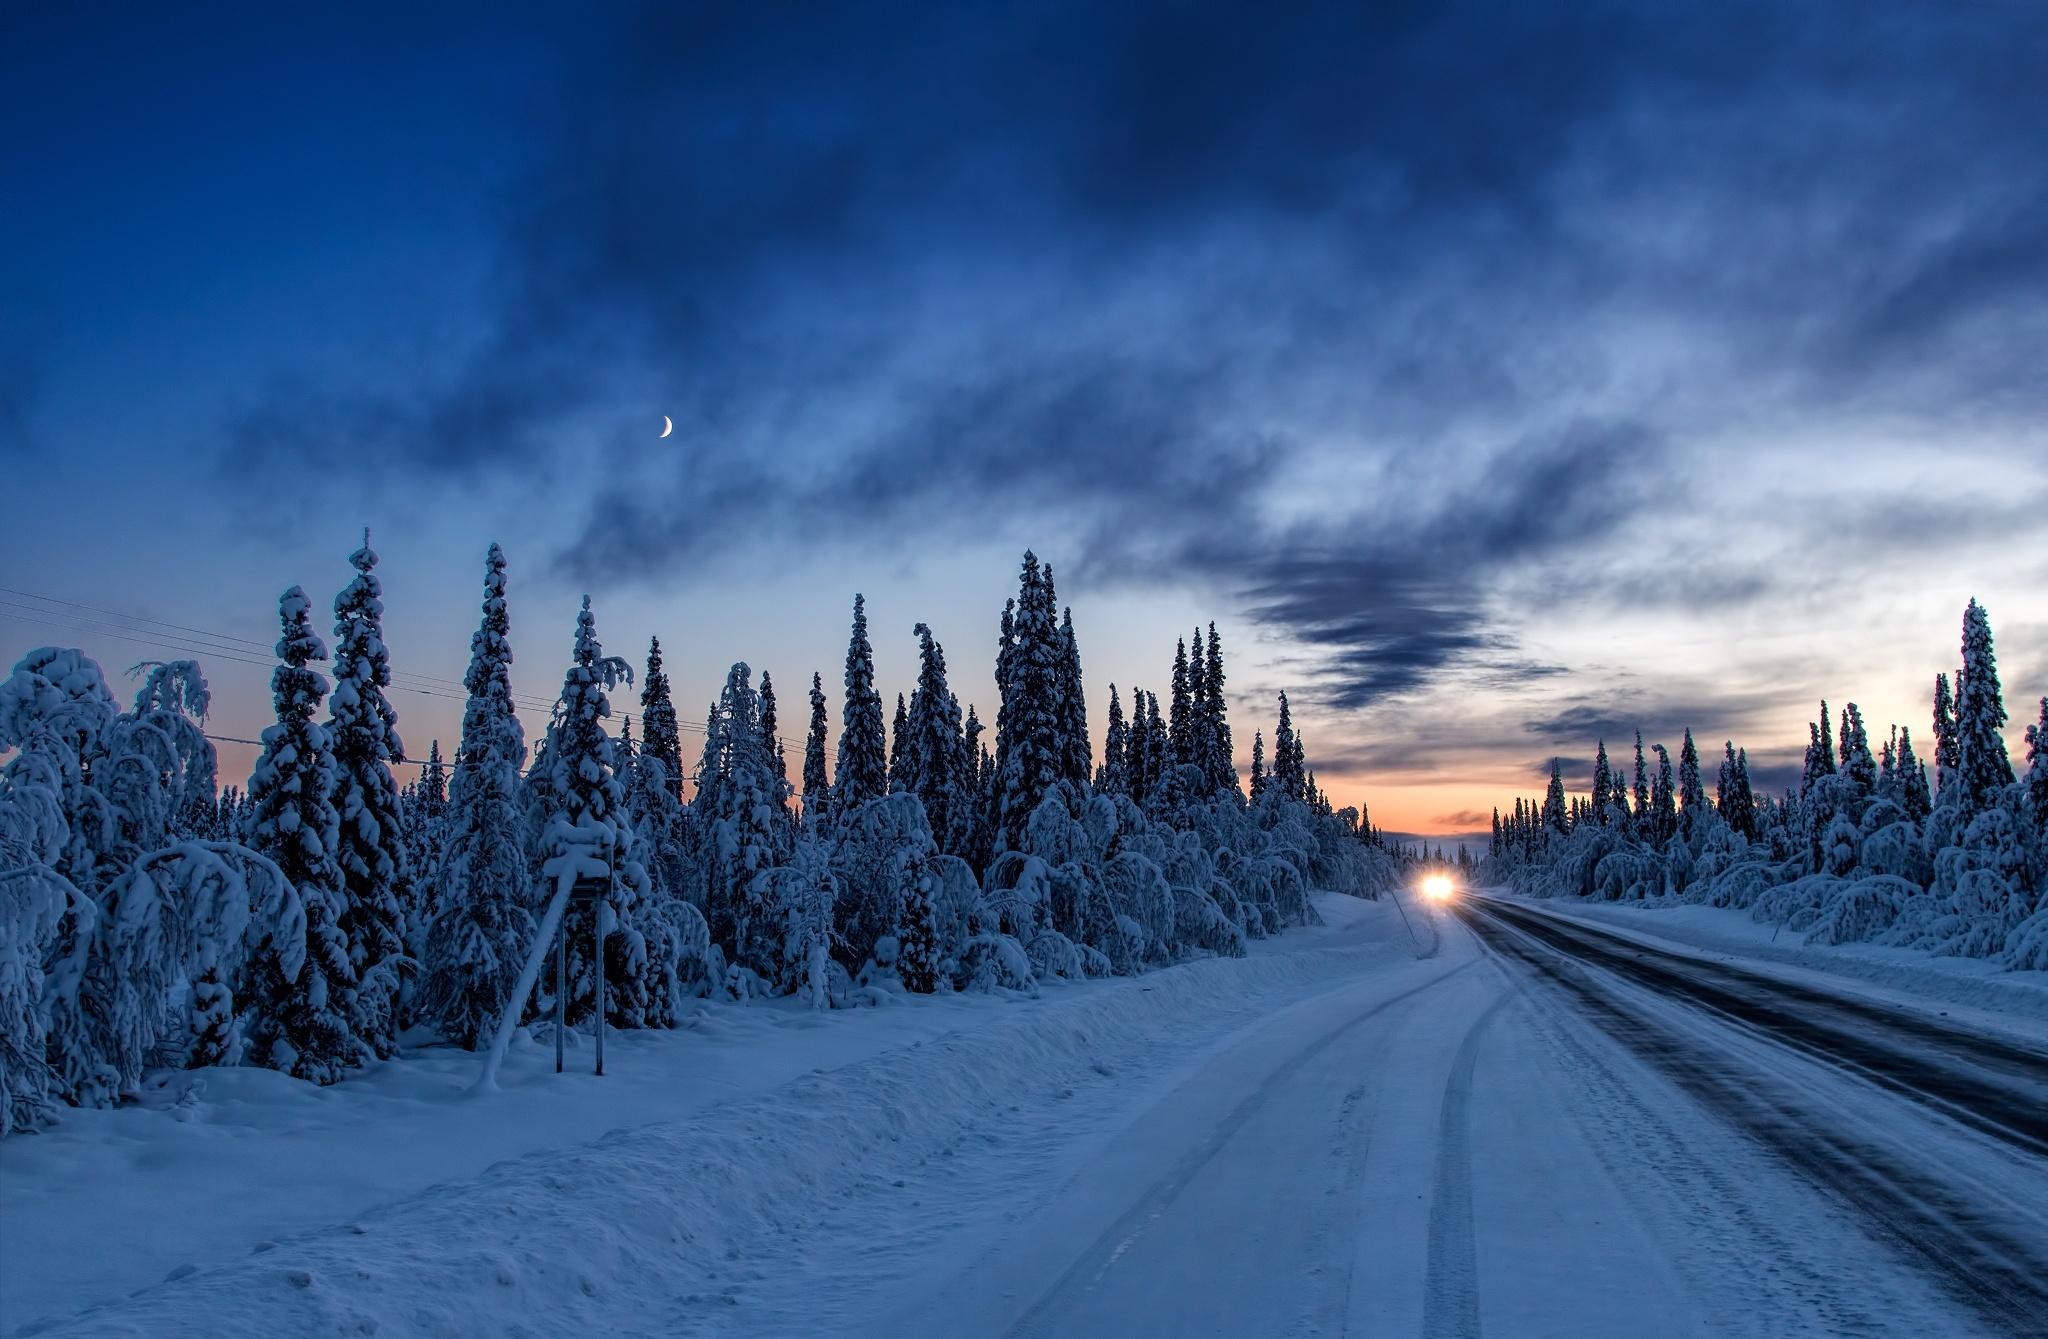 дорога зима вечер снег  № 3902508 без смс